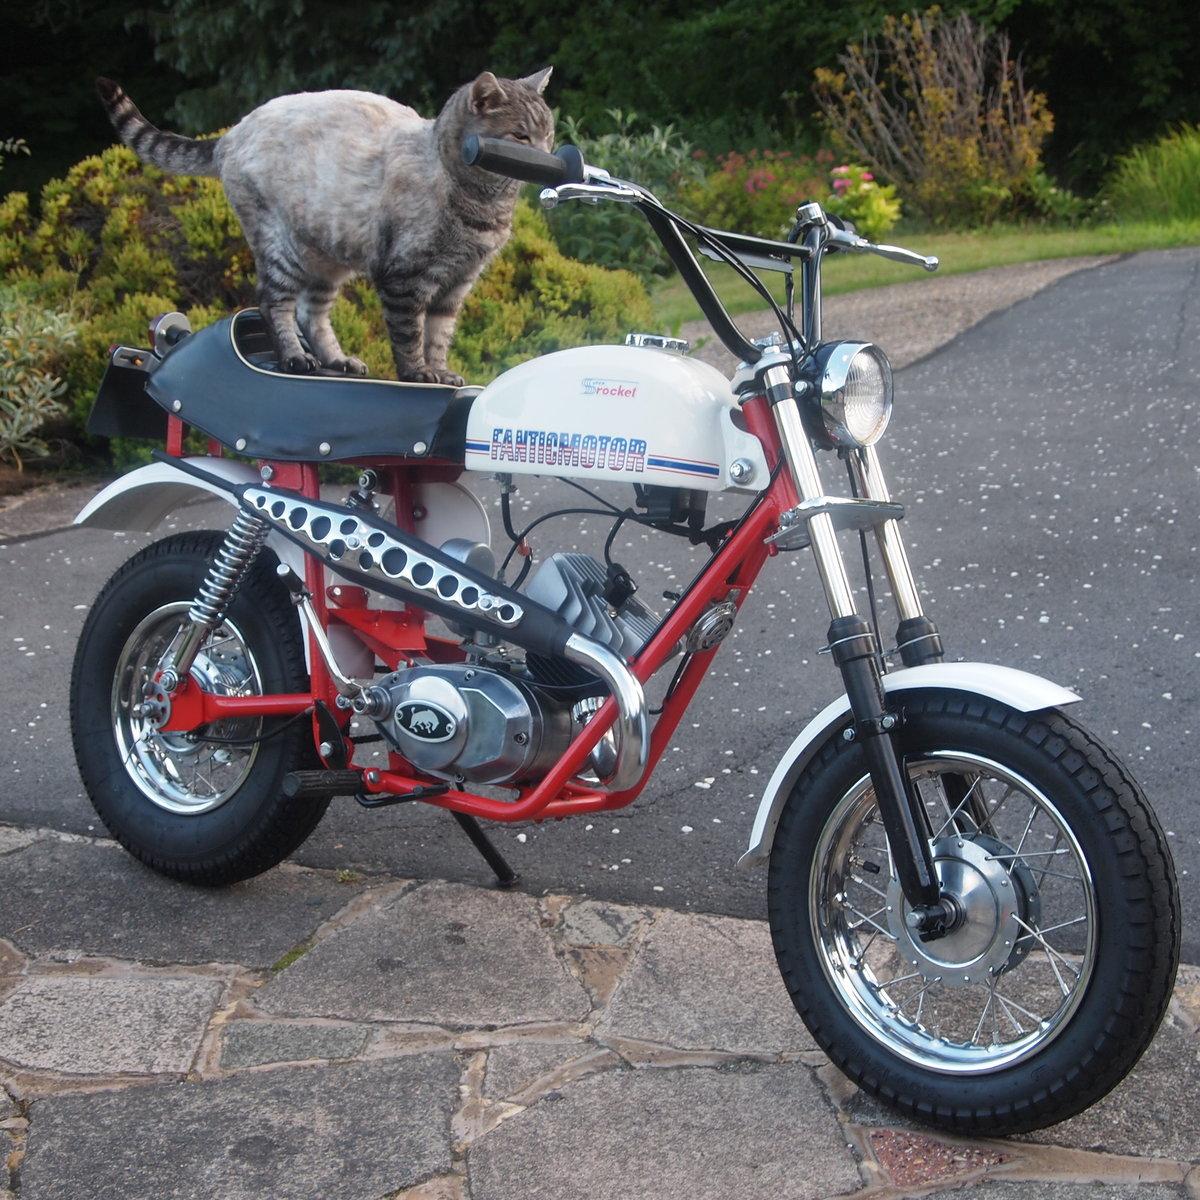 1973 Rare 49cc Fantic Super Rocket Monkey Bike, Wonderful. For Sale (picture 2 of 6)